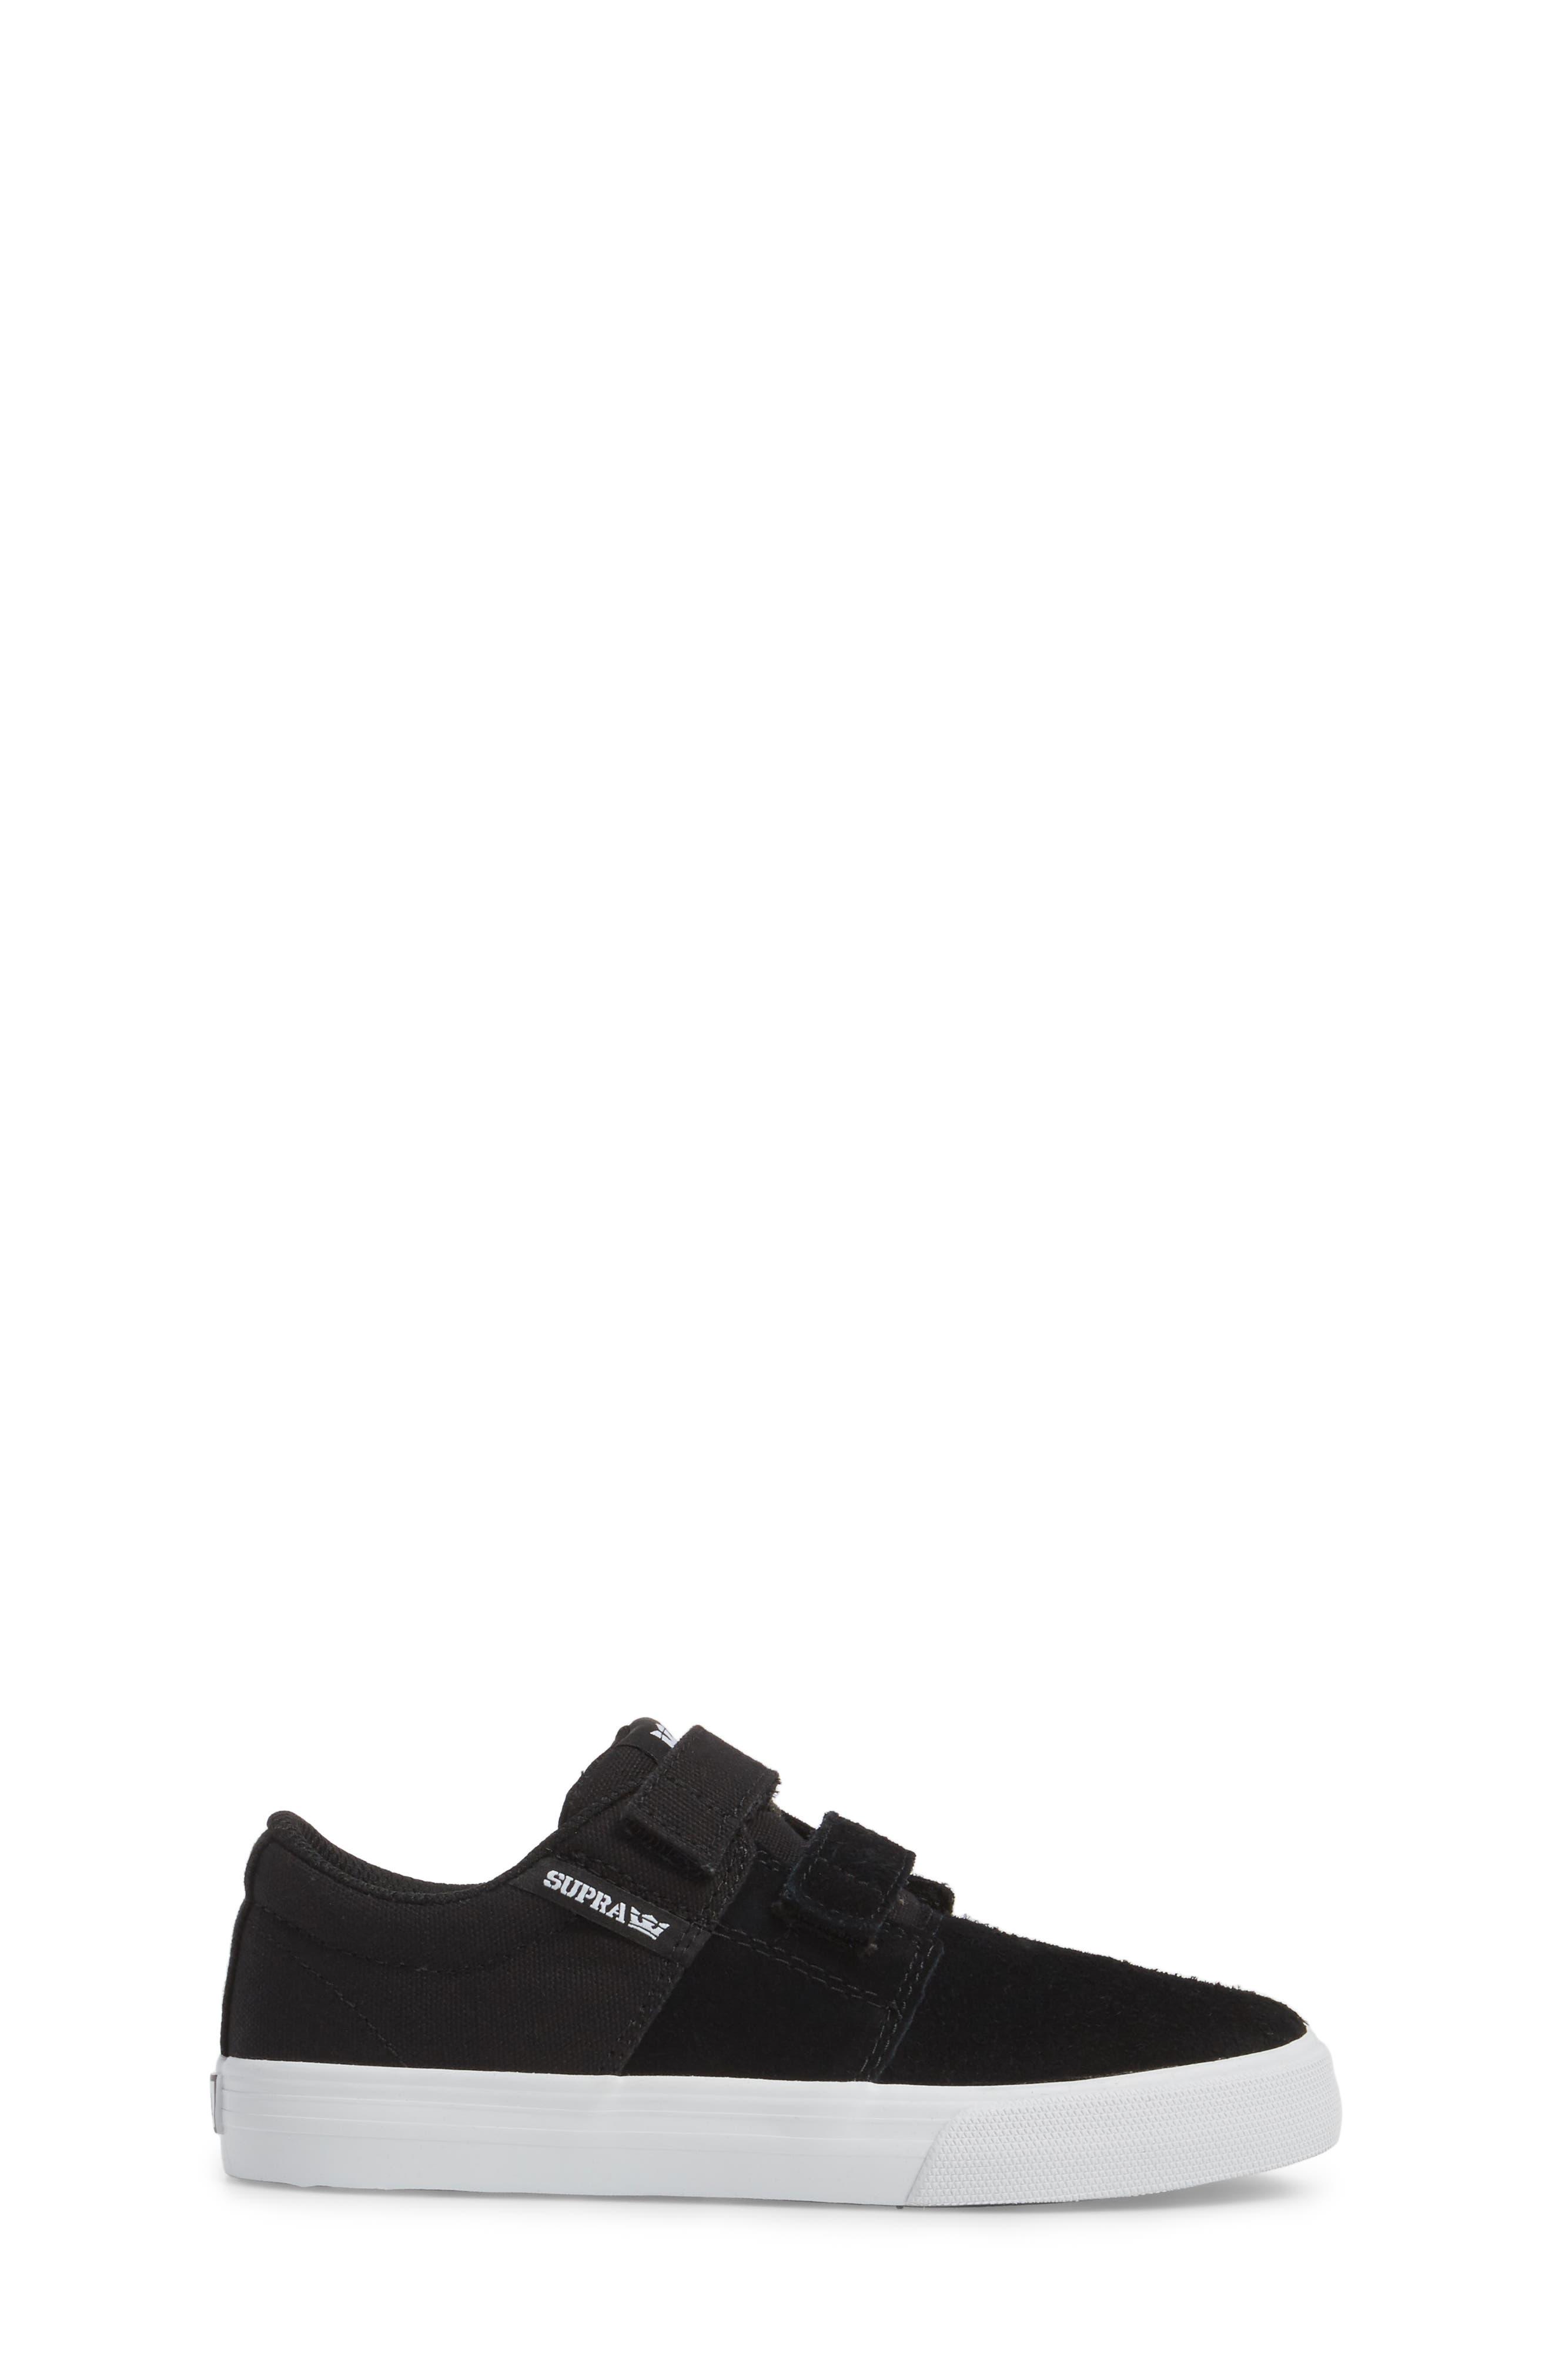 Stacks Low Top Sneaker,                             Alternate thumbnail 3, color,                             BLACK - WHITE